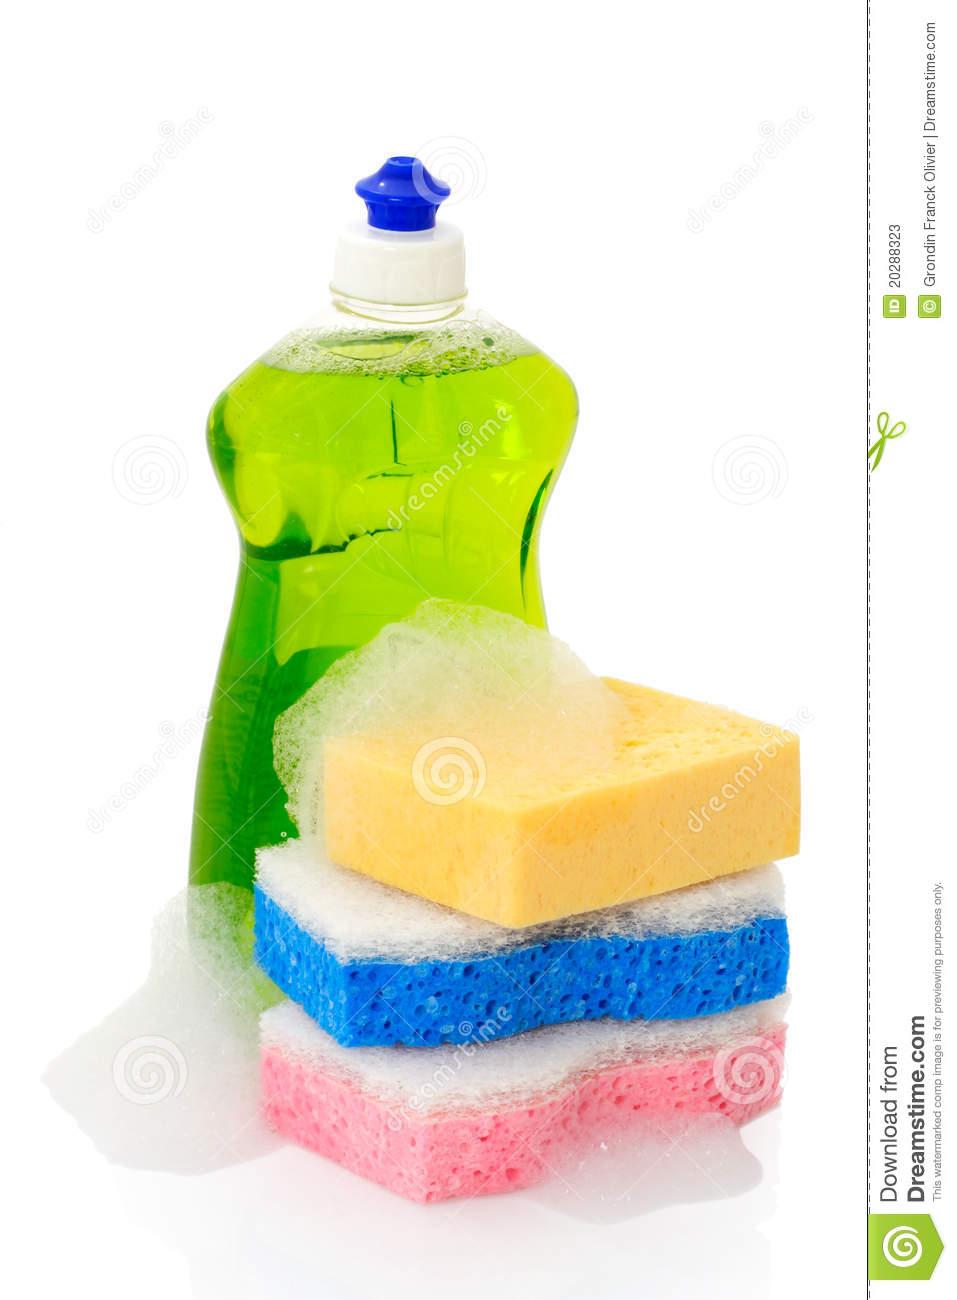 Liquid Soap Clip Art Dish Soap And Sponges #MkaugV.